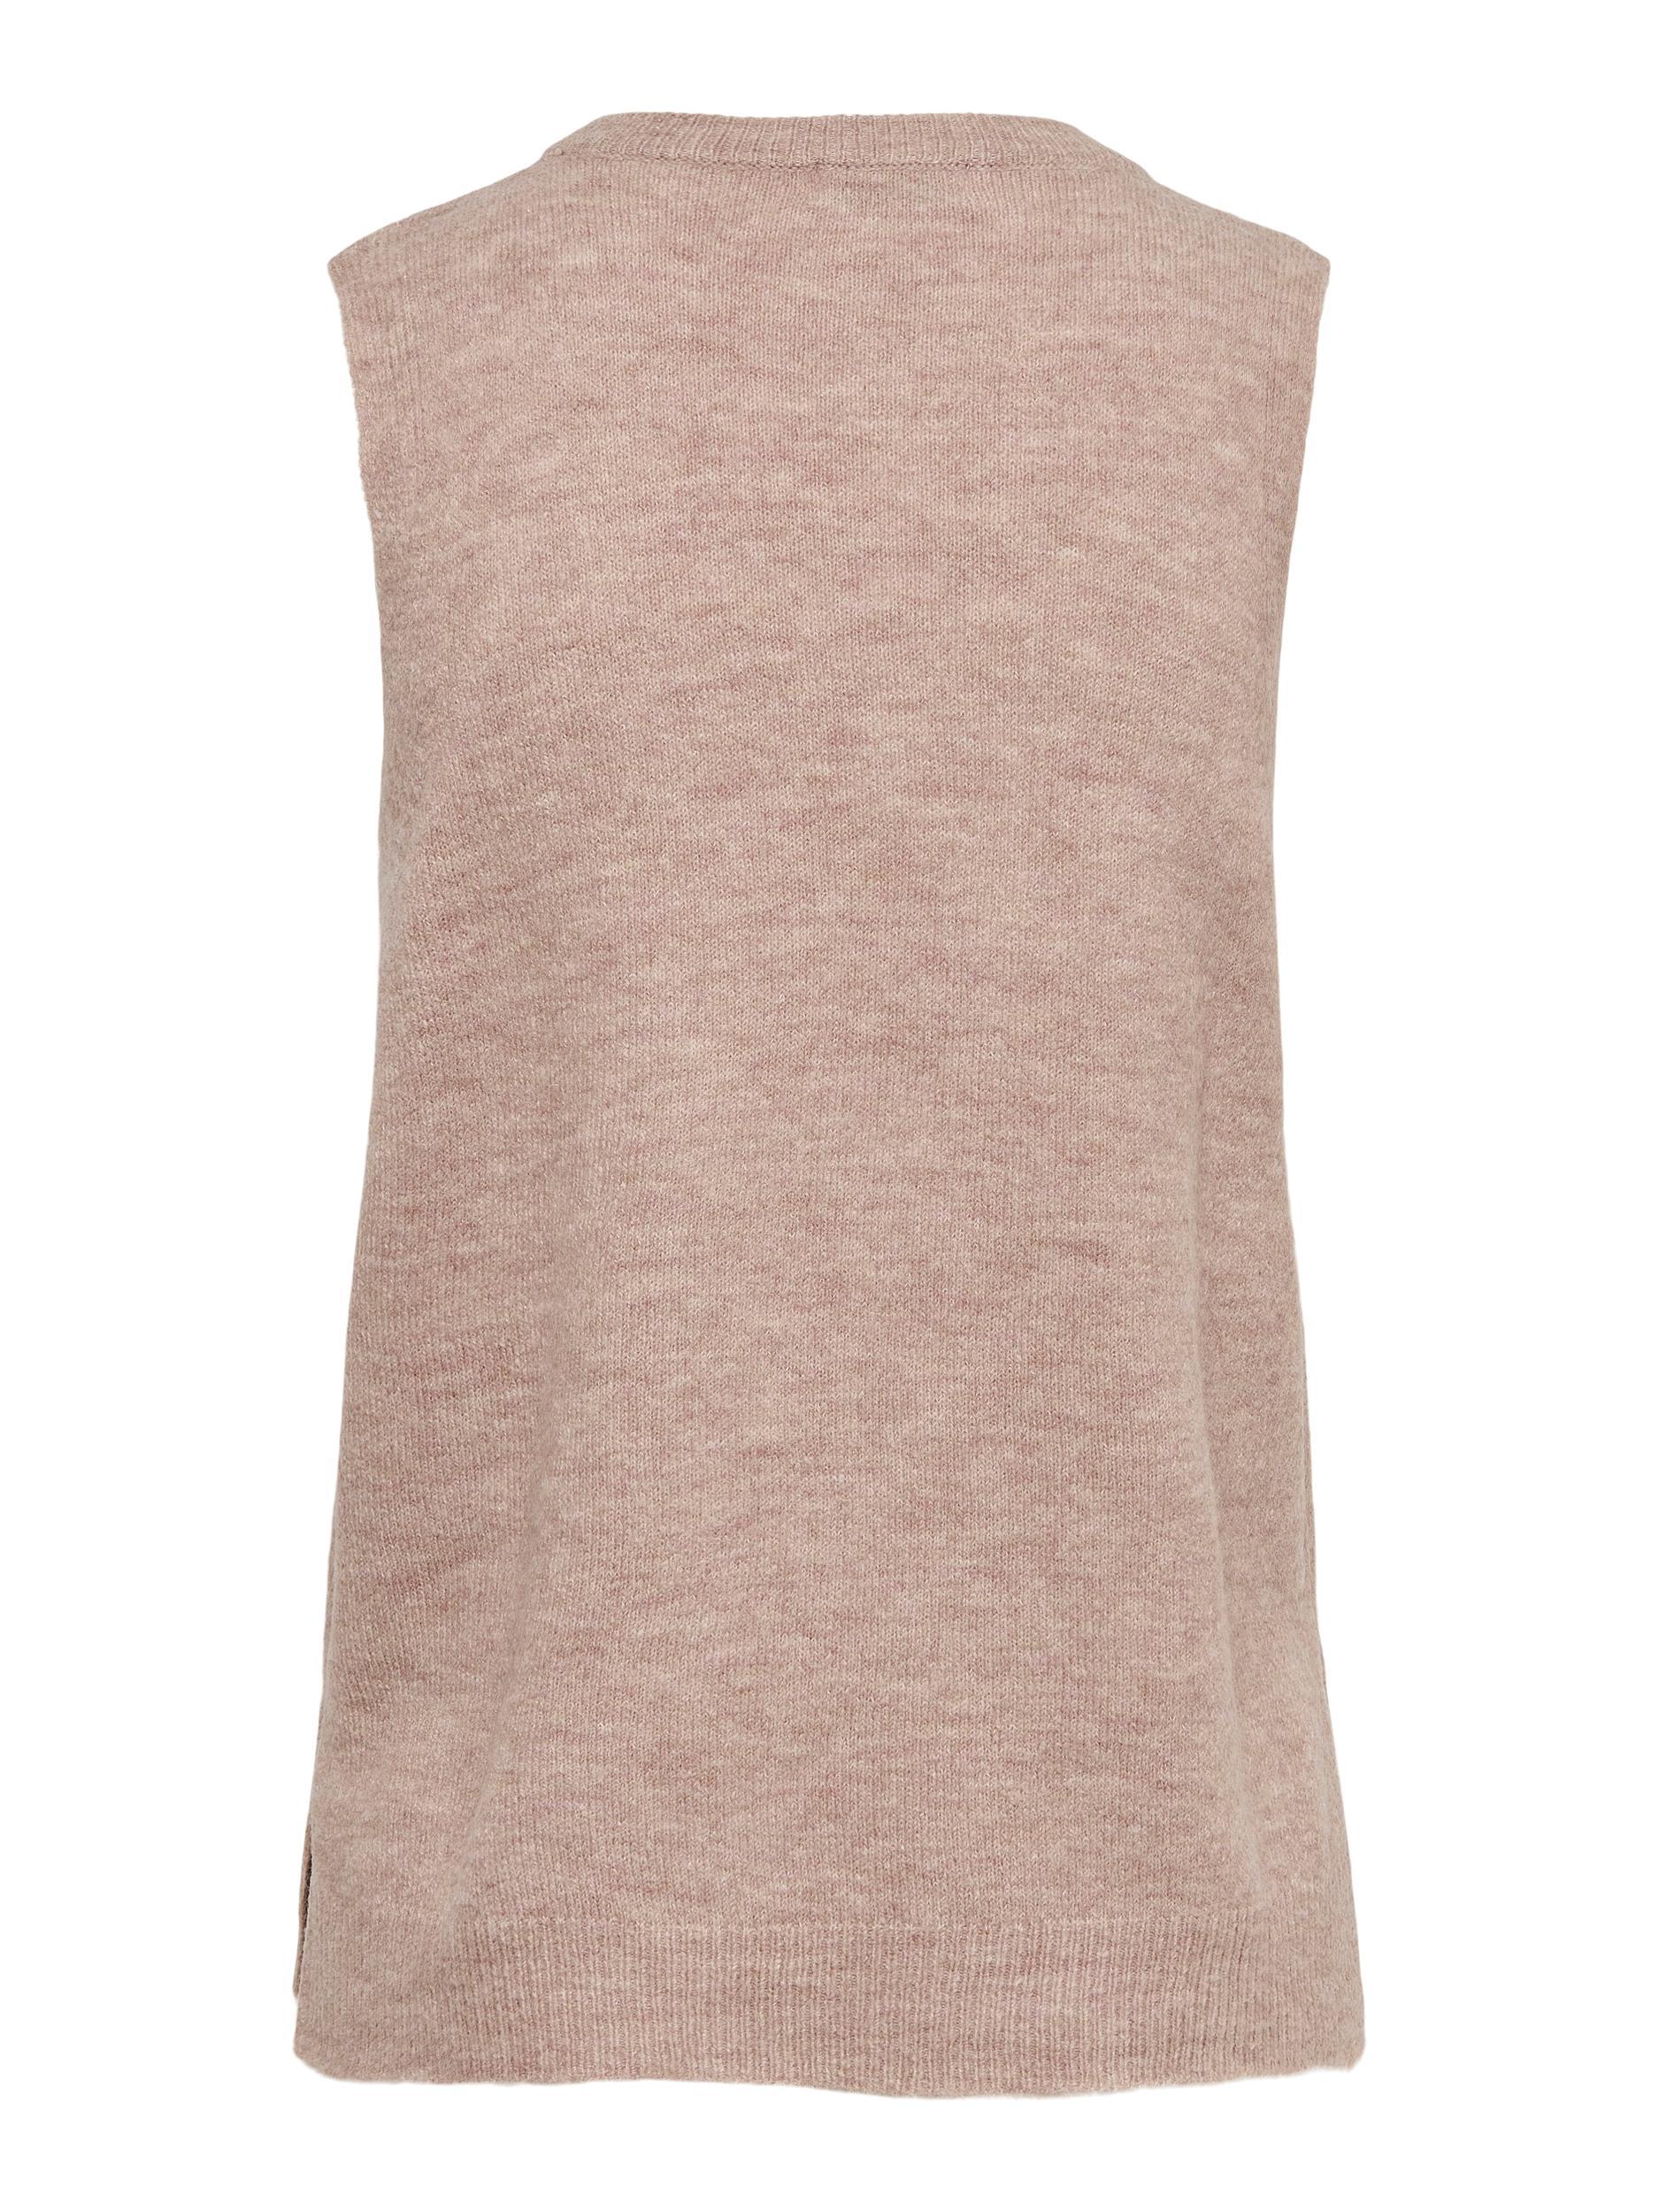 Jacqueline de Yong Elanor vest, adobe rose, large